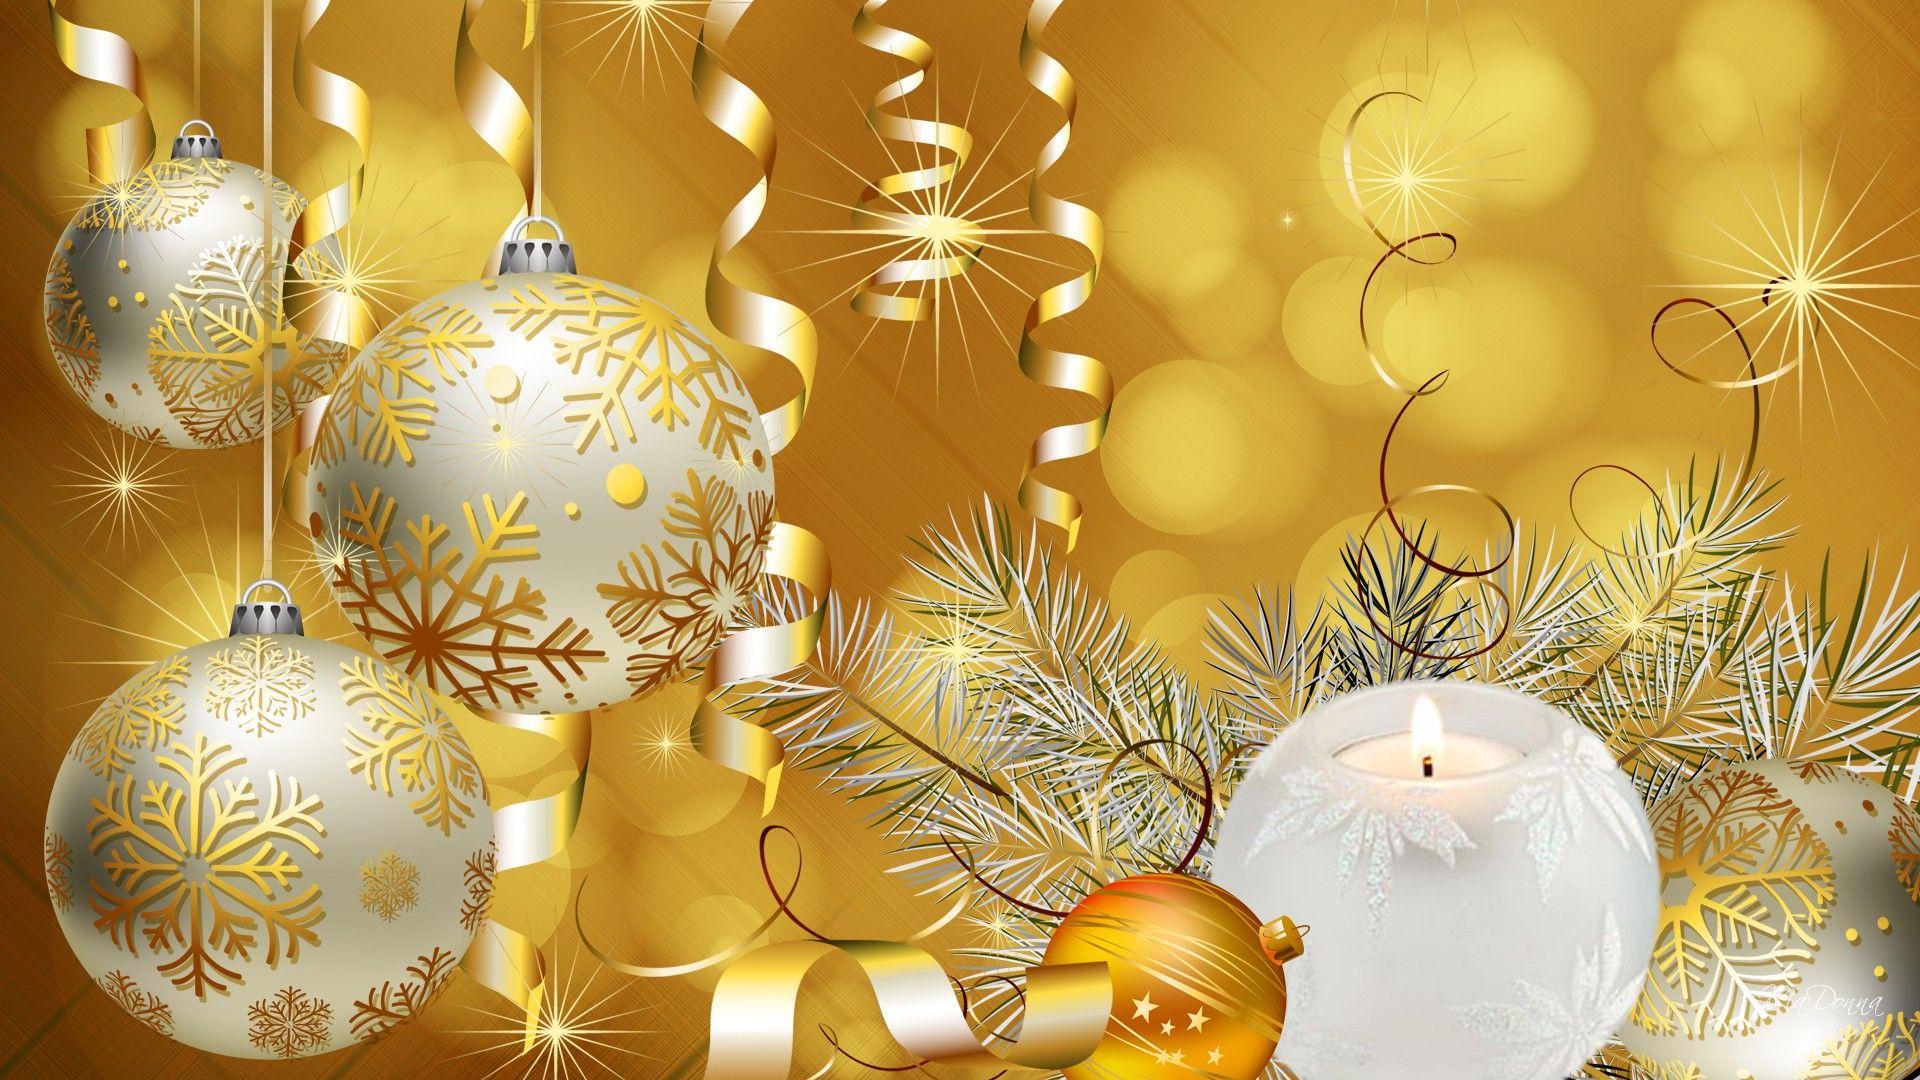 pin von pajure auf seasons holidays gold christmas. Black Bedroom Furniture Sets. Home Design Ideas